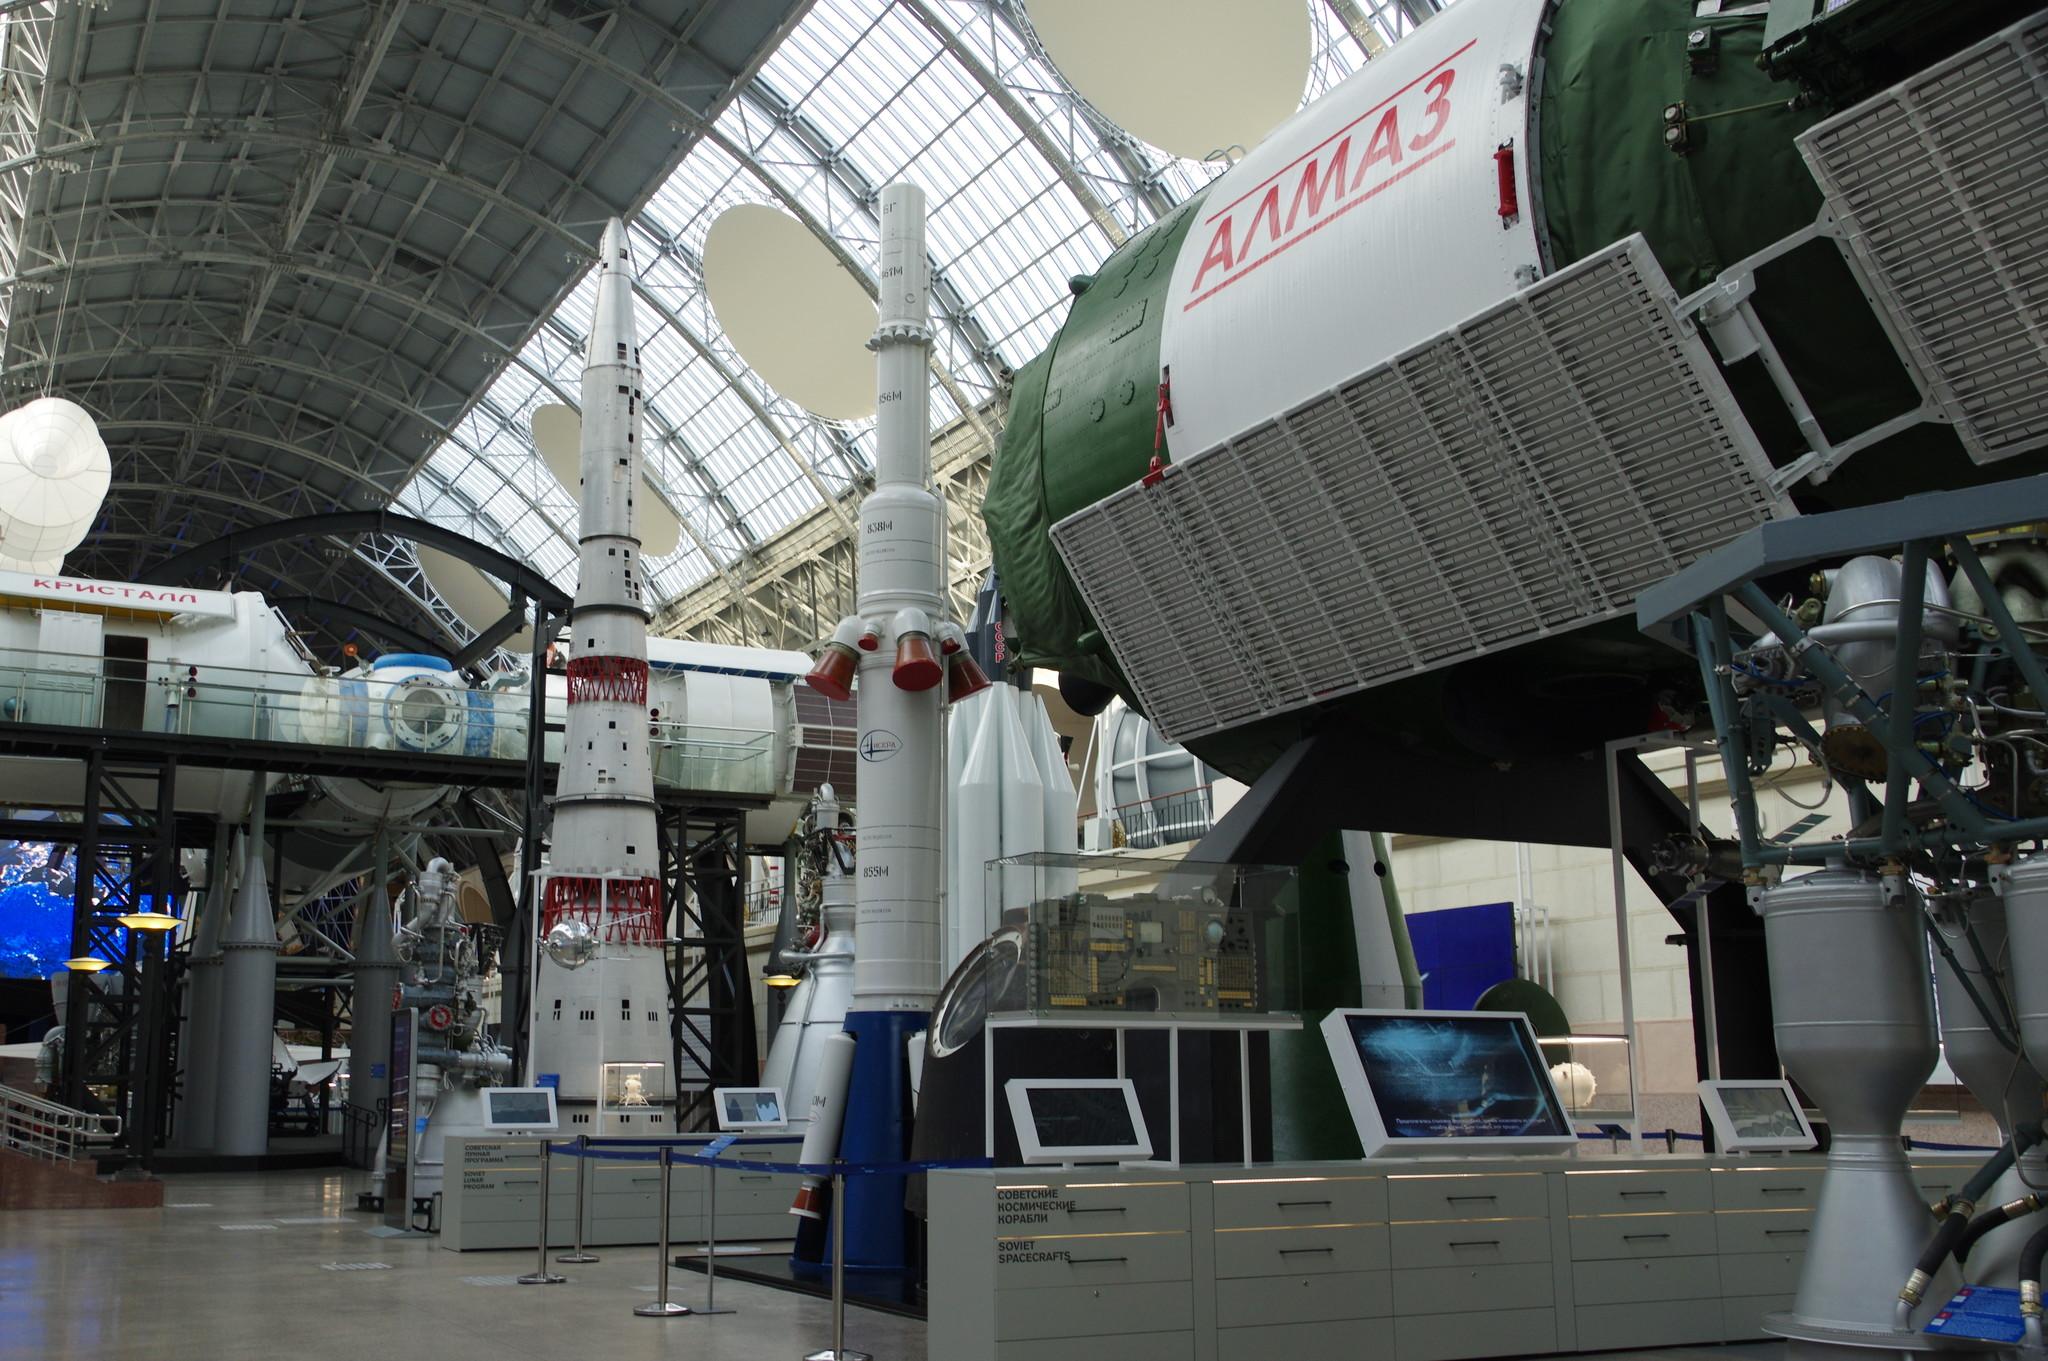 Центр «Космонавтика и авиация» на ВДНХ